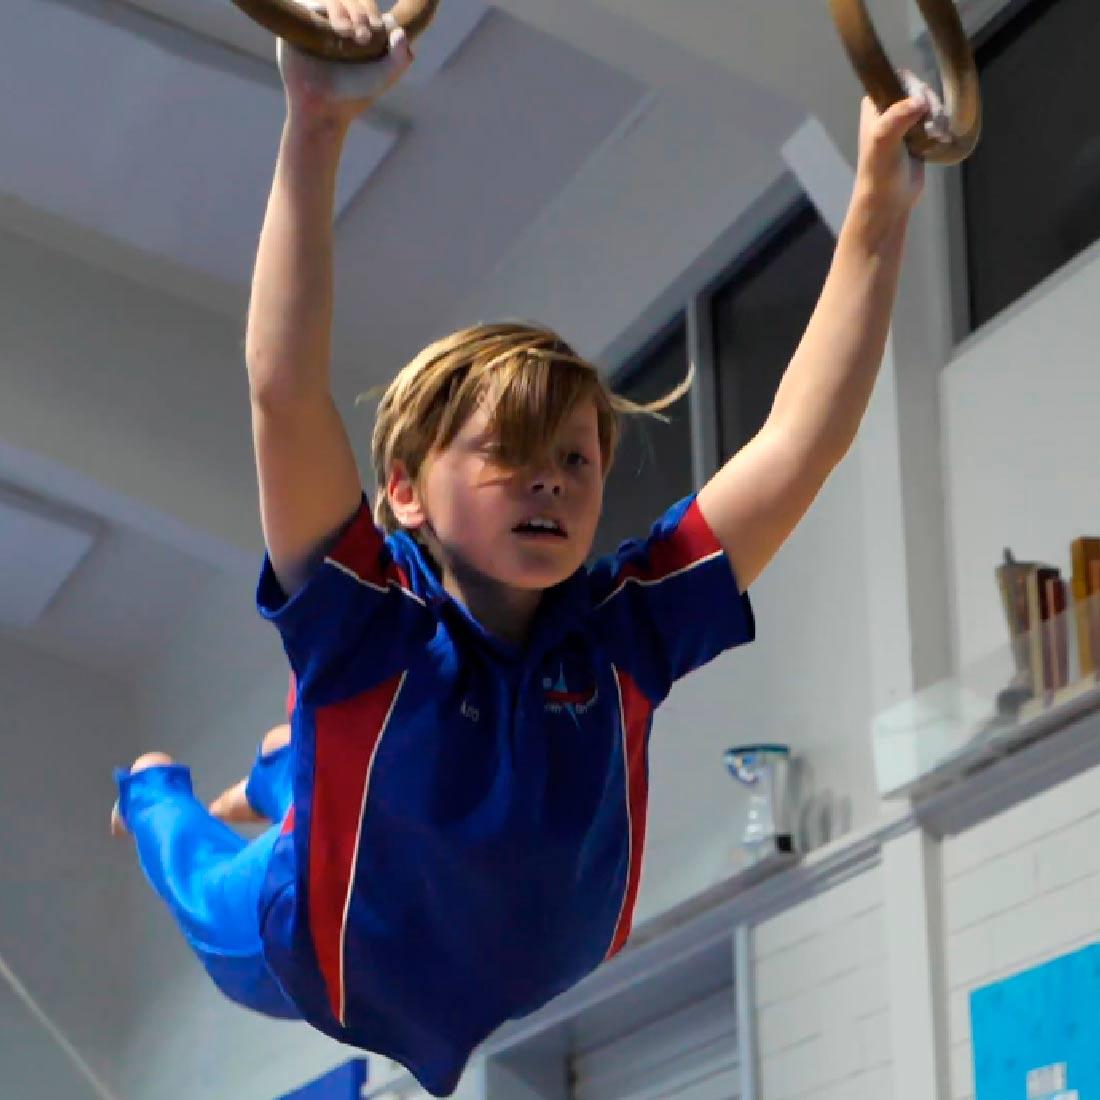 Gymnastics – Male Artistic Gymnastics